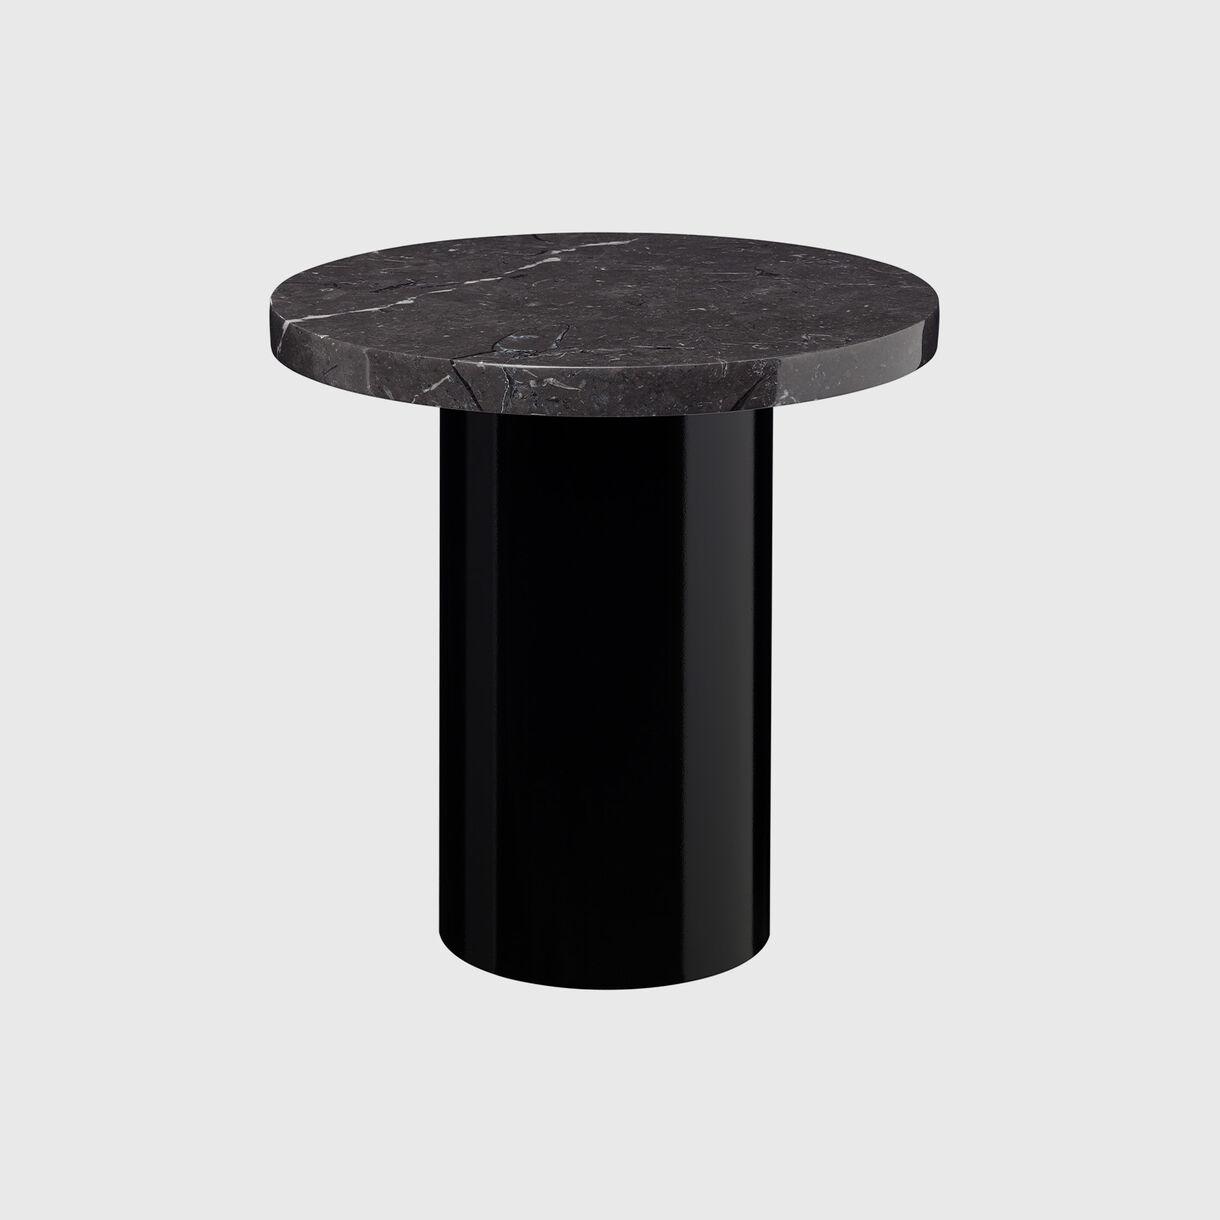 Enoki Side Table, Jet Black & Black Marble